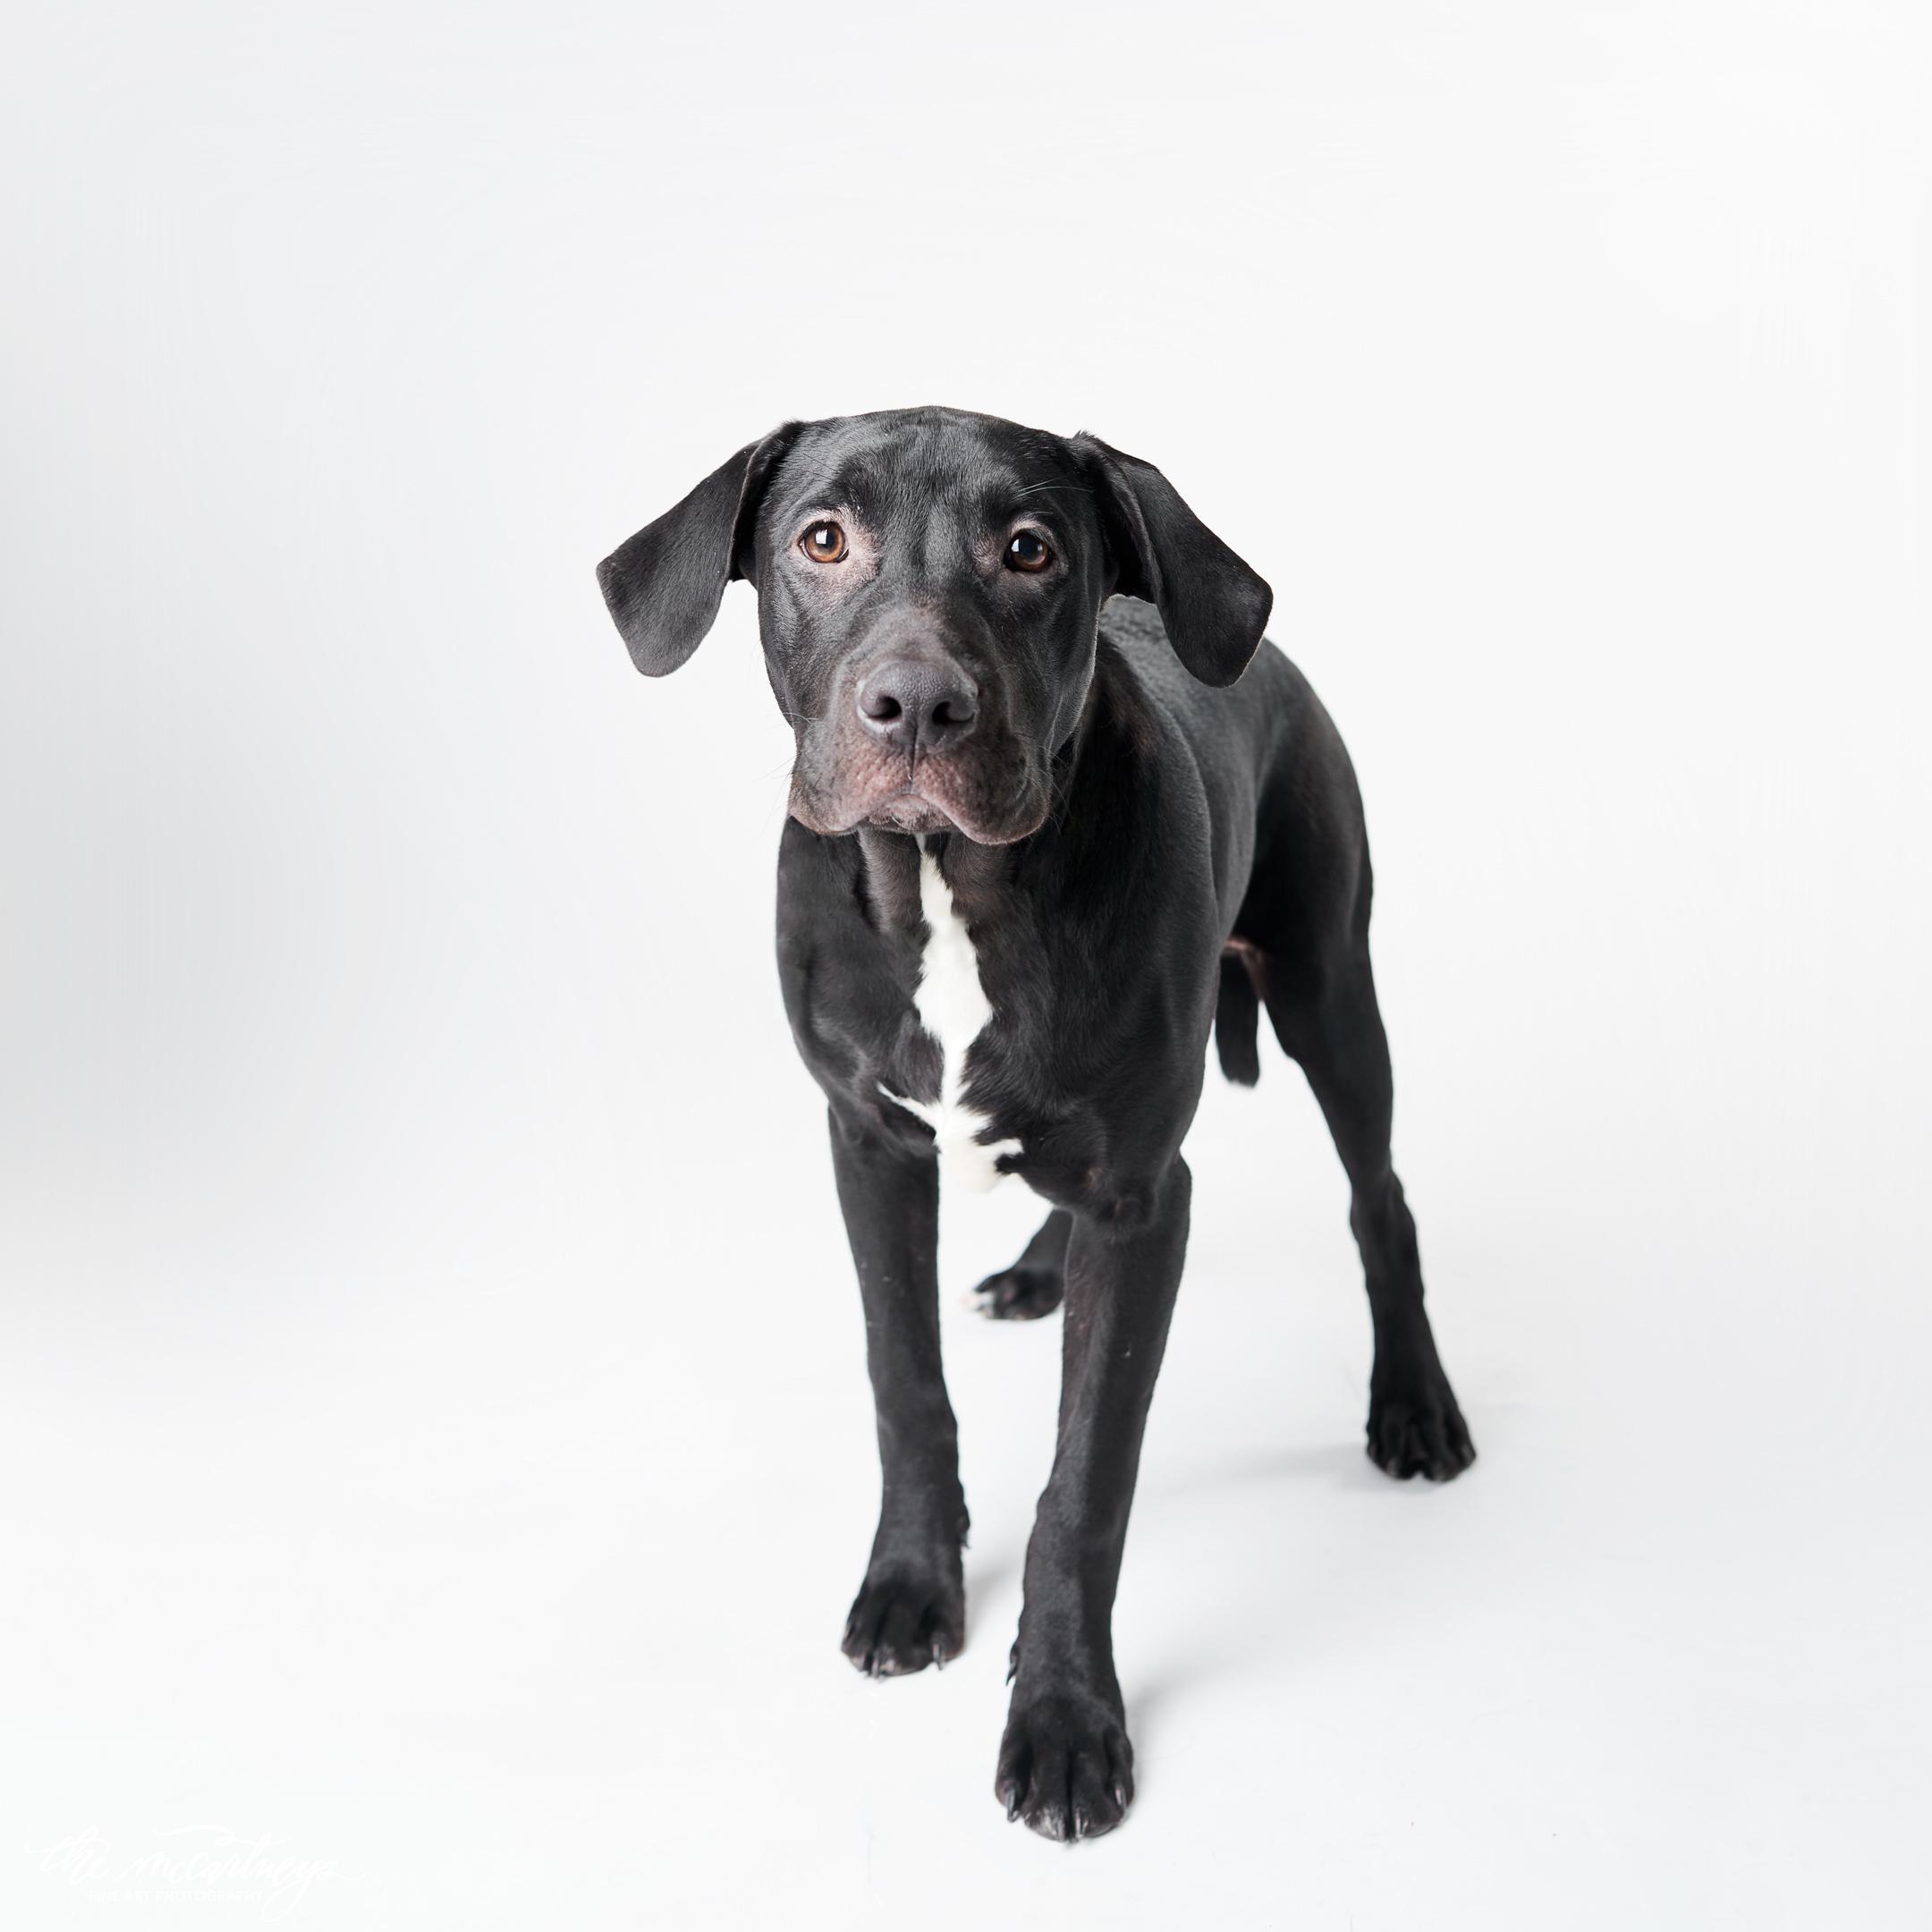 Humane Society - EVERY DOG DESERVES A HOME